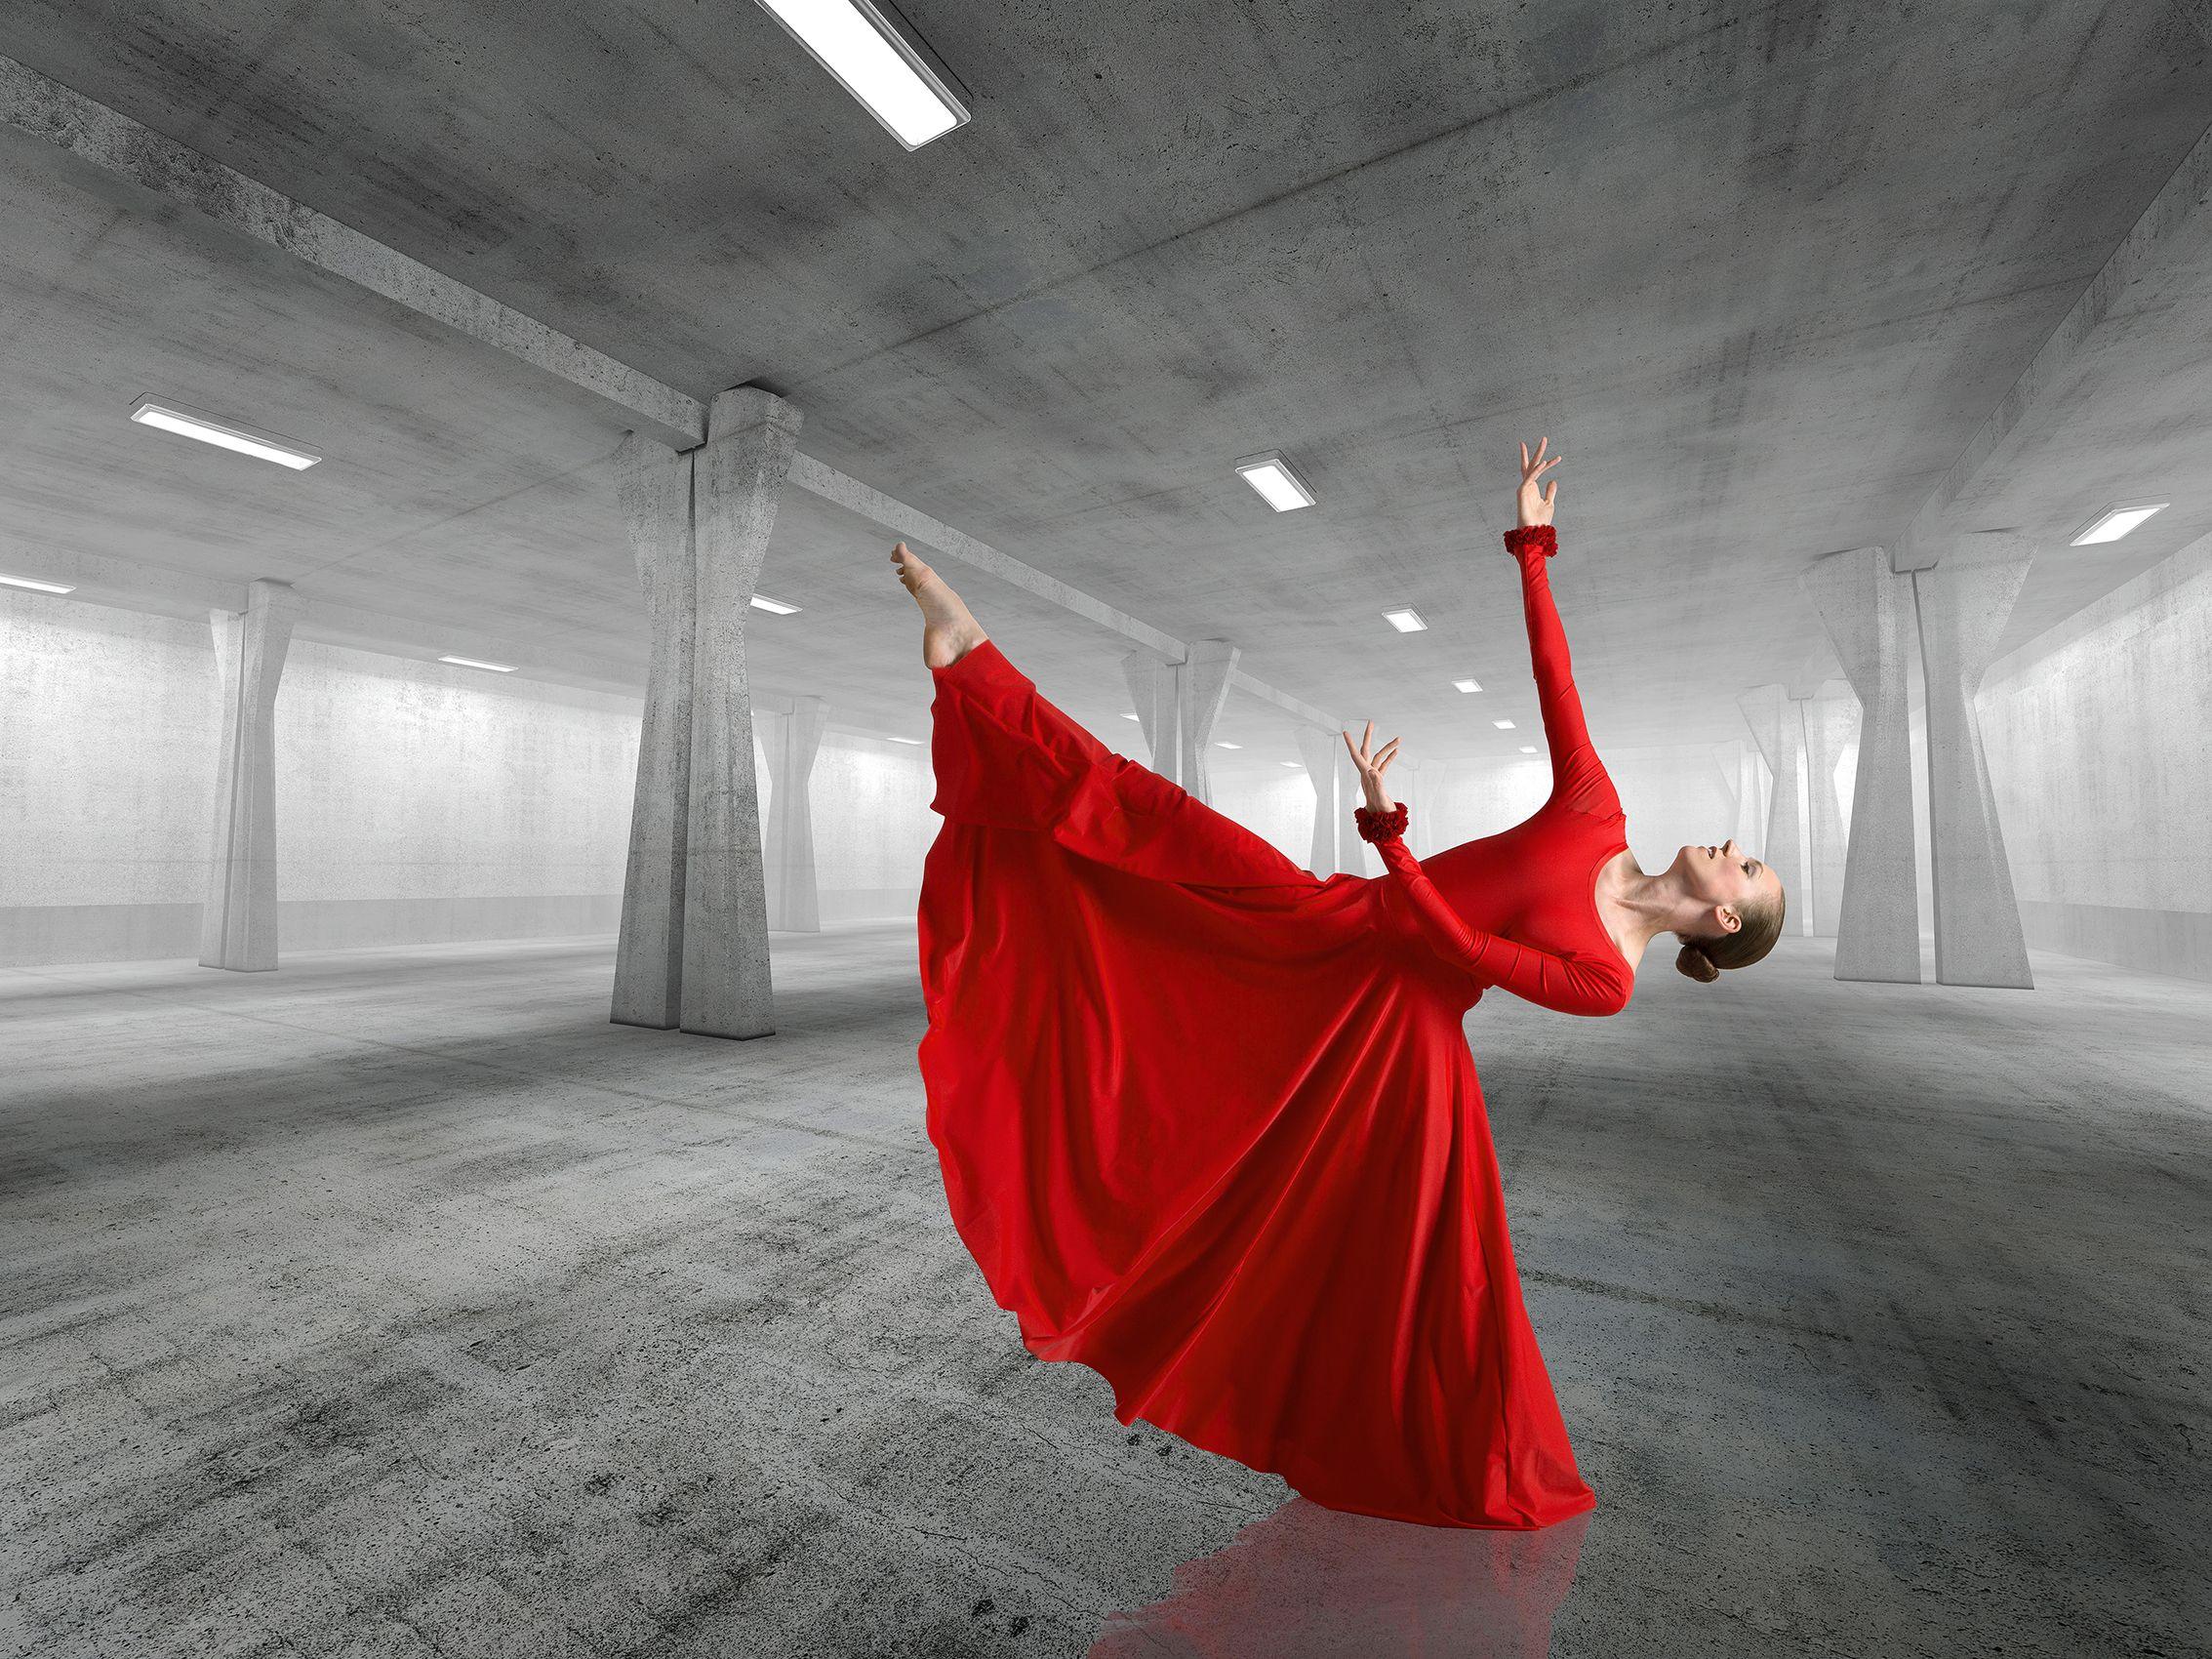 Sarah_Red_Dress_F_W.jpg